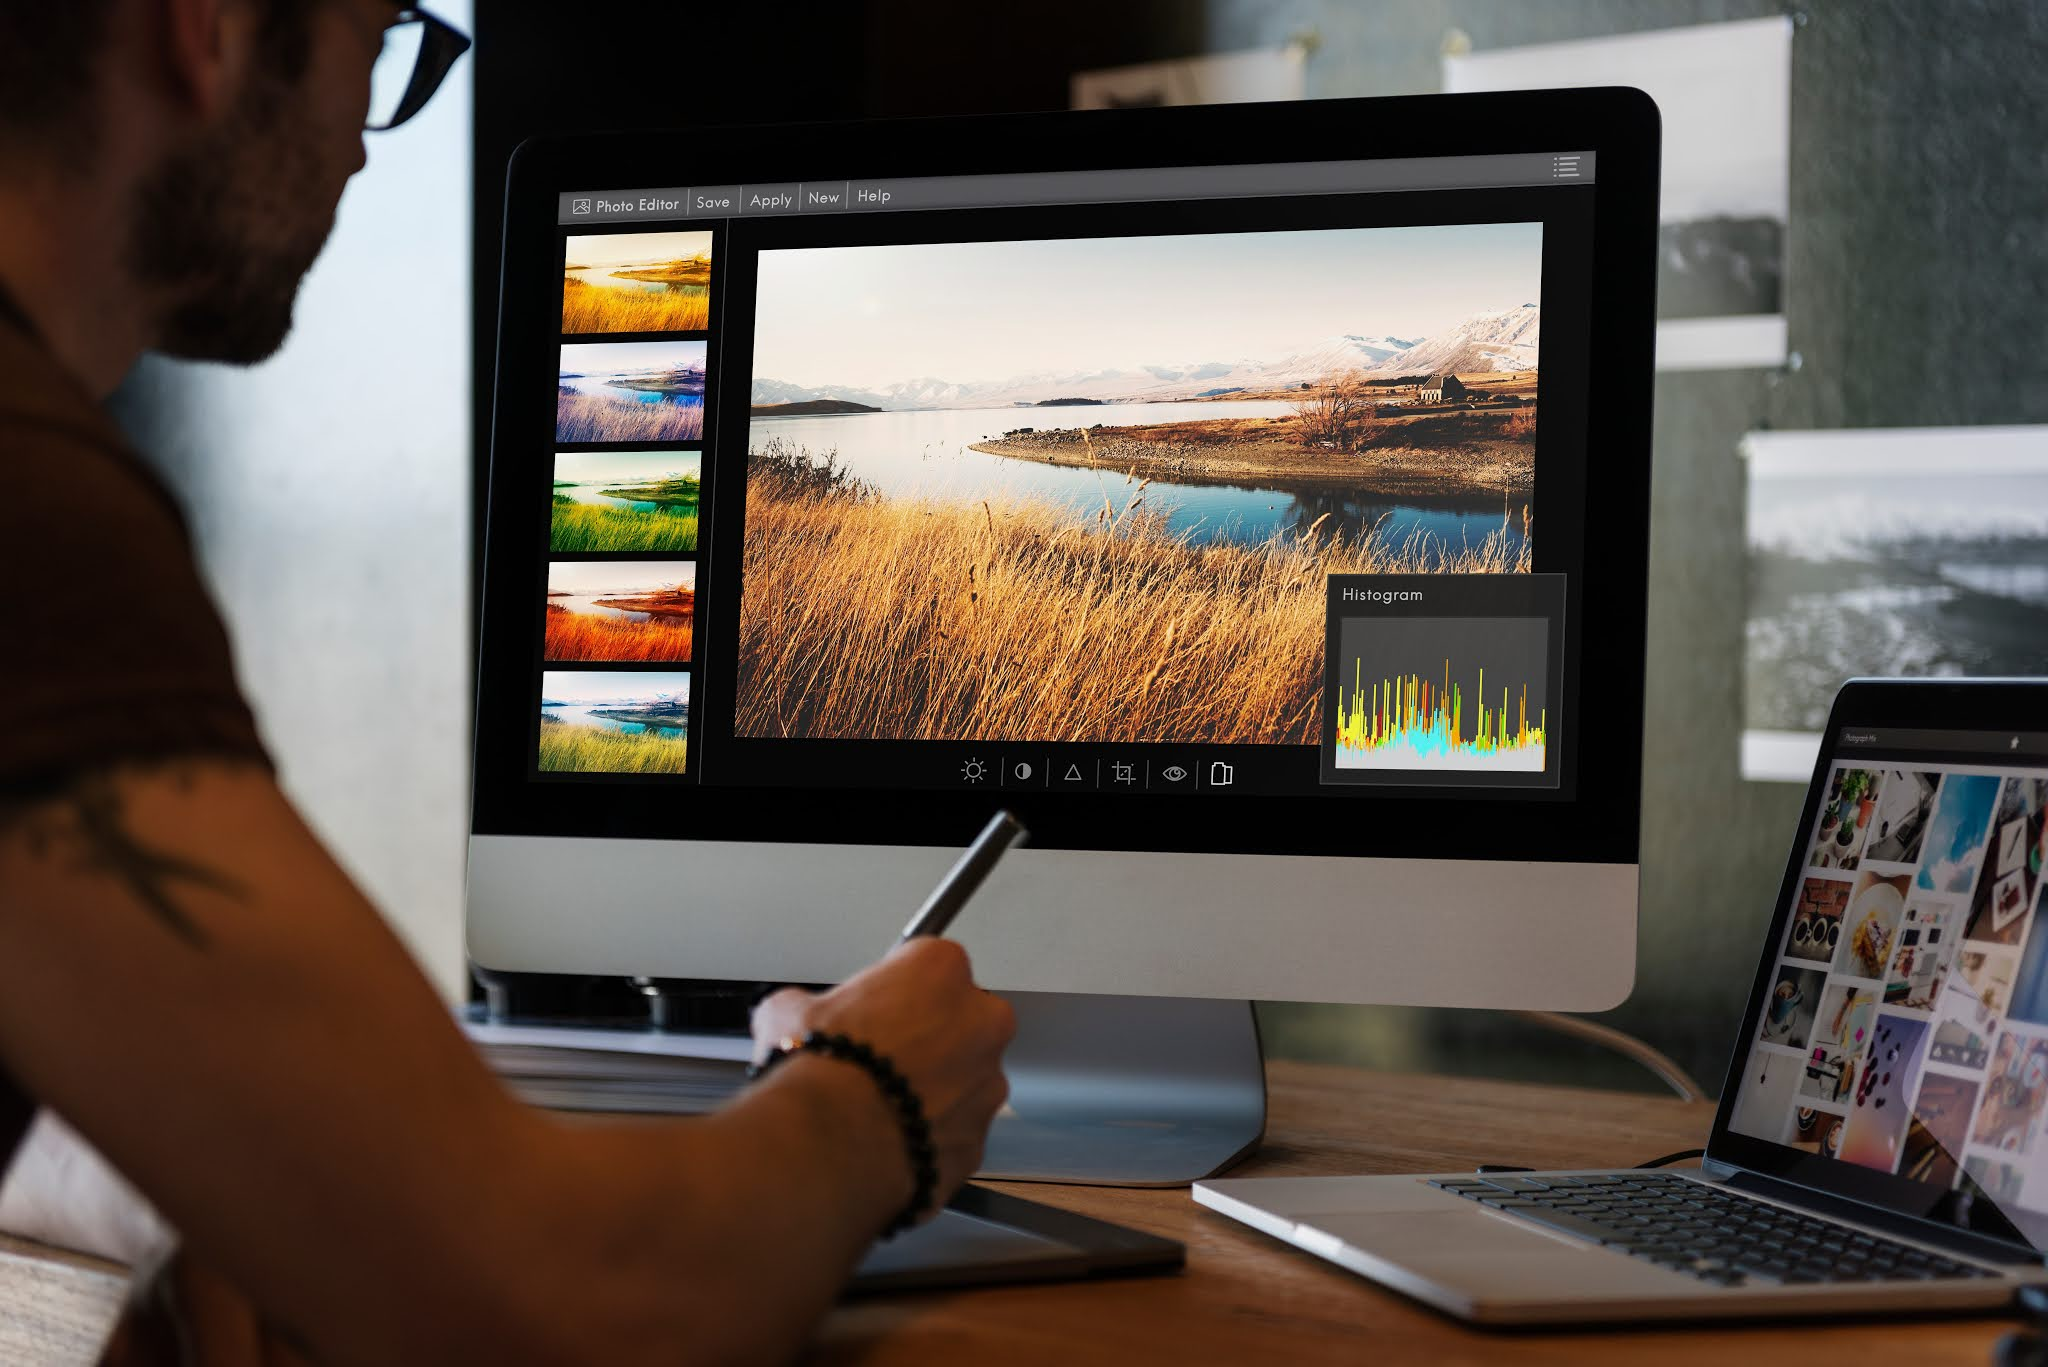 kerja sampingan untuk pelajar, Editing Foto